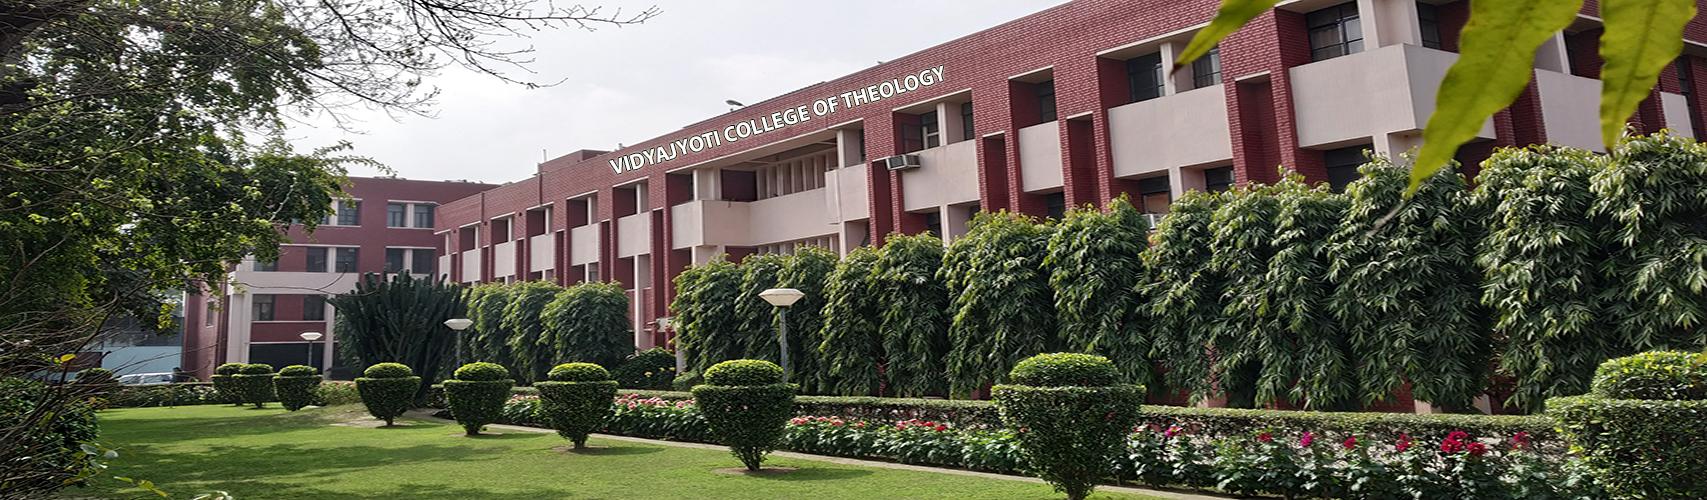 1 College building